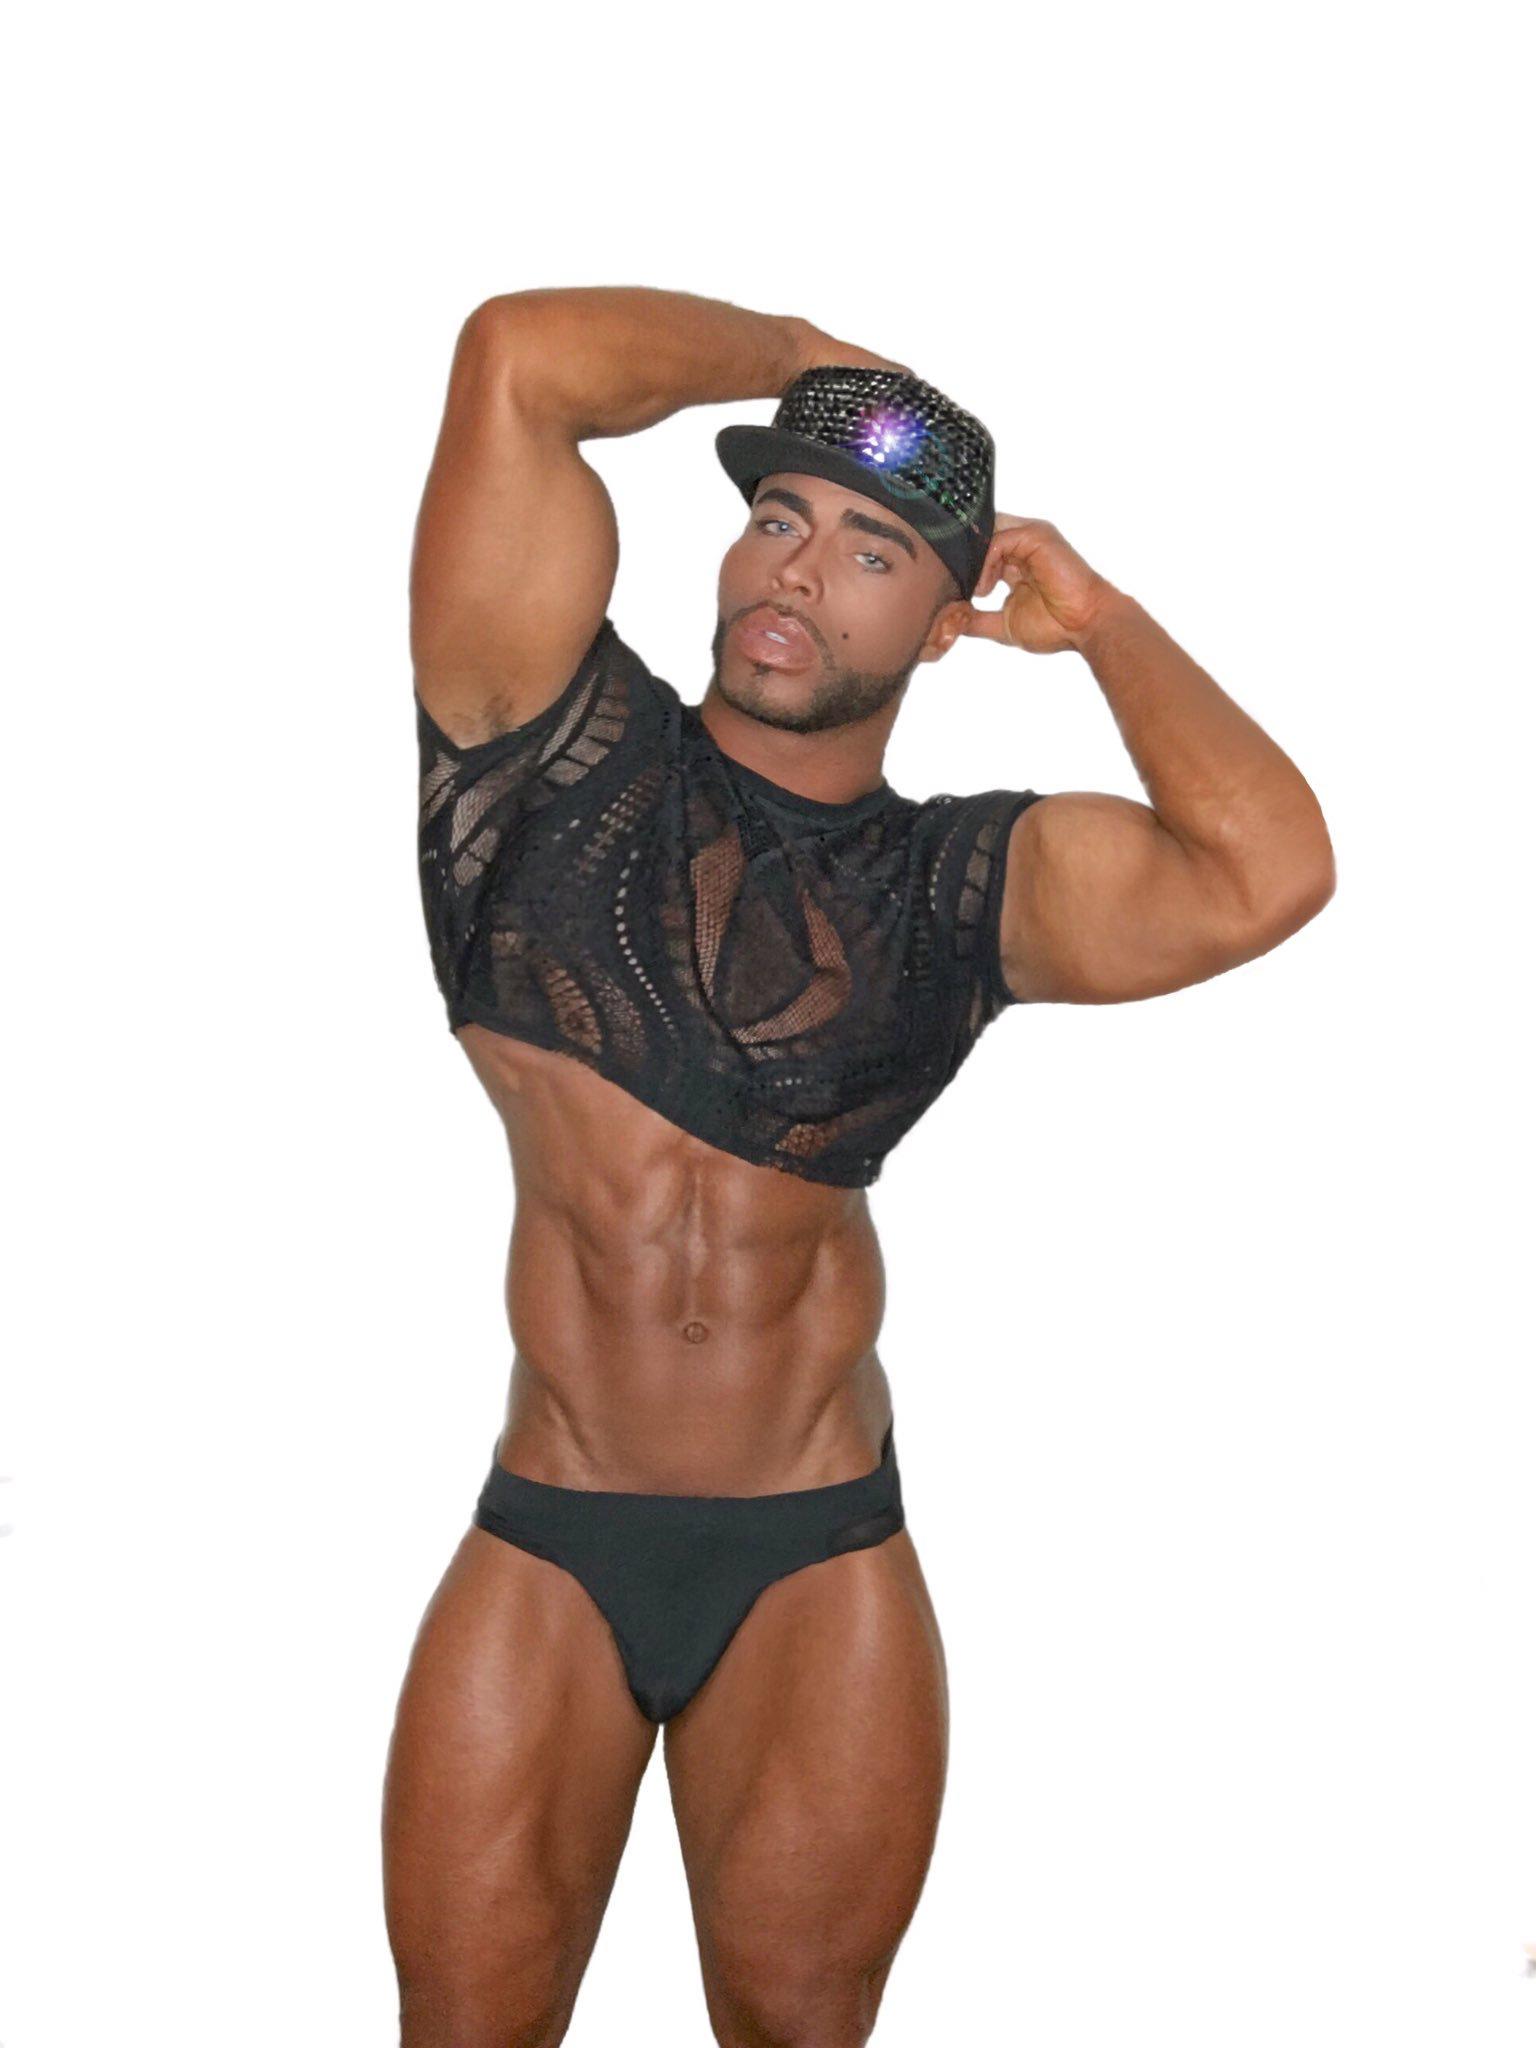 abb0ca9fcc2e Hot Black Guys, Black Men, Black Underwear, Men's Undies, Black Beauty,